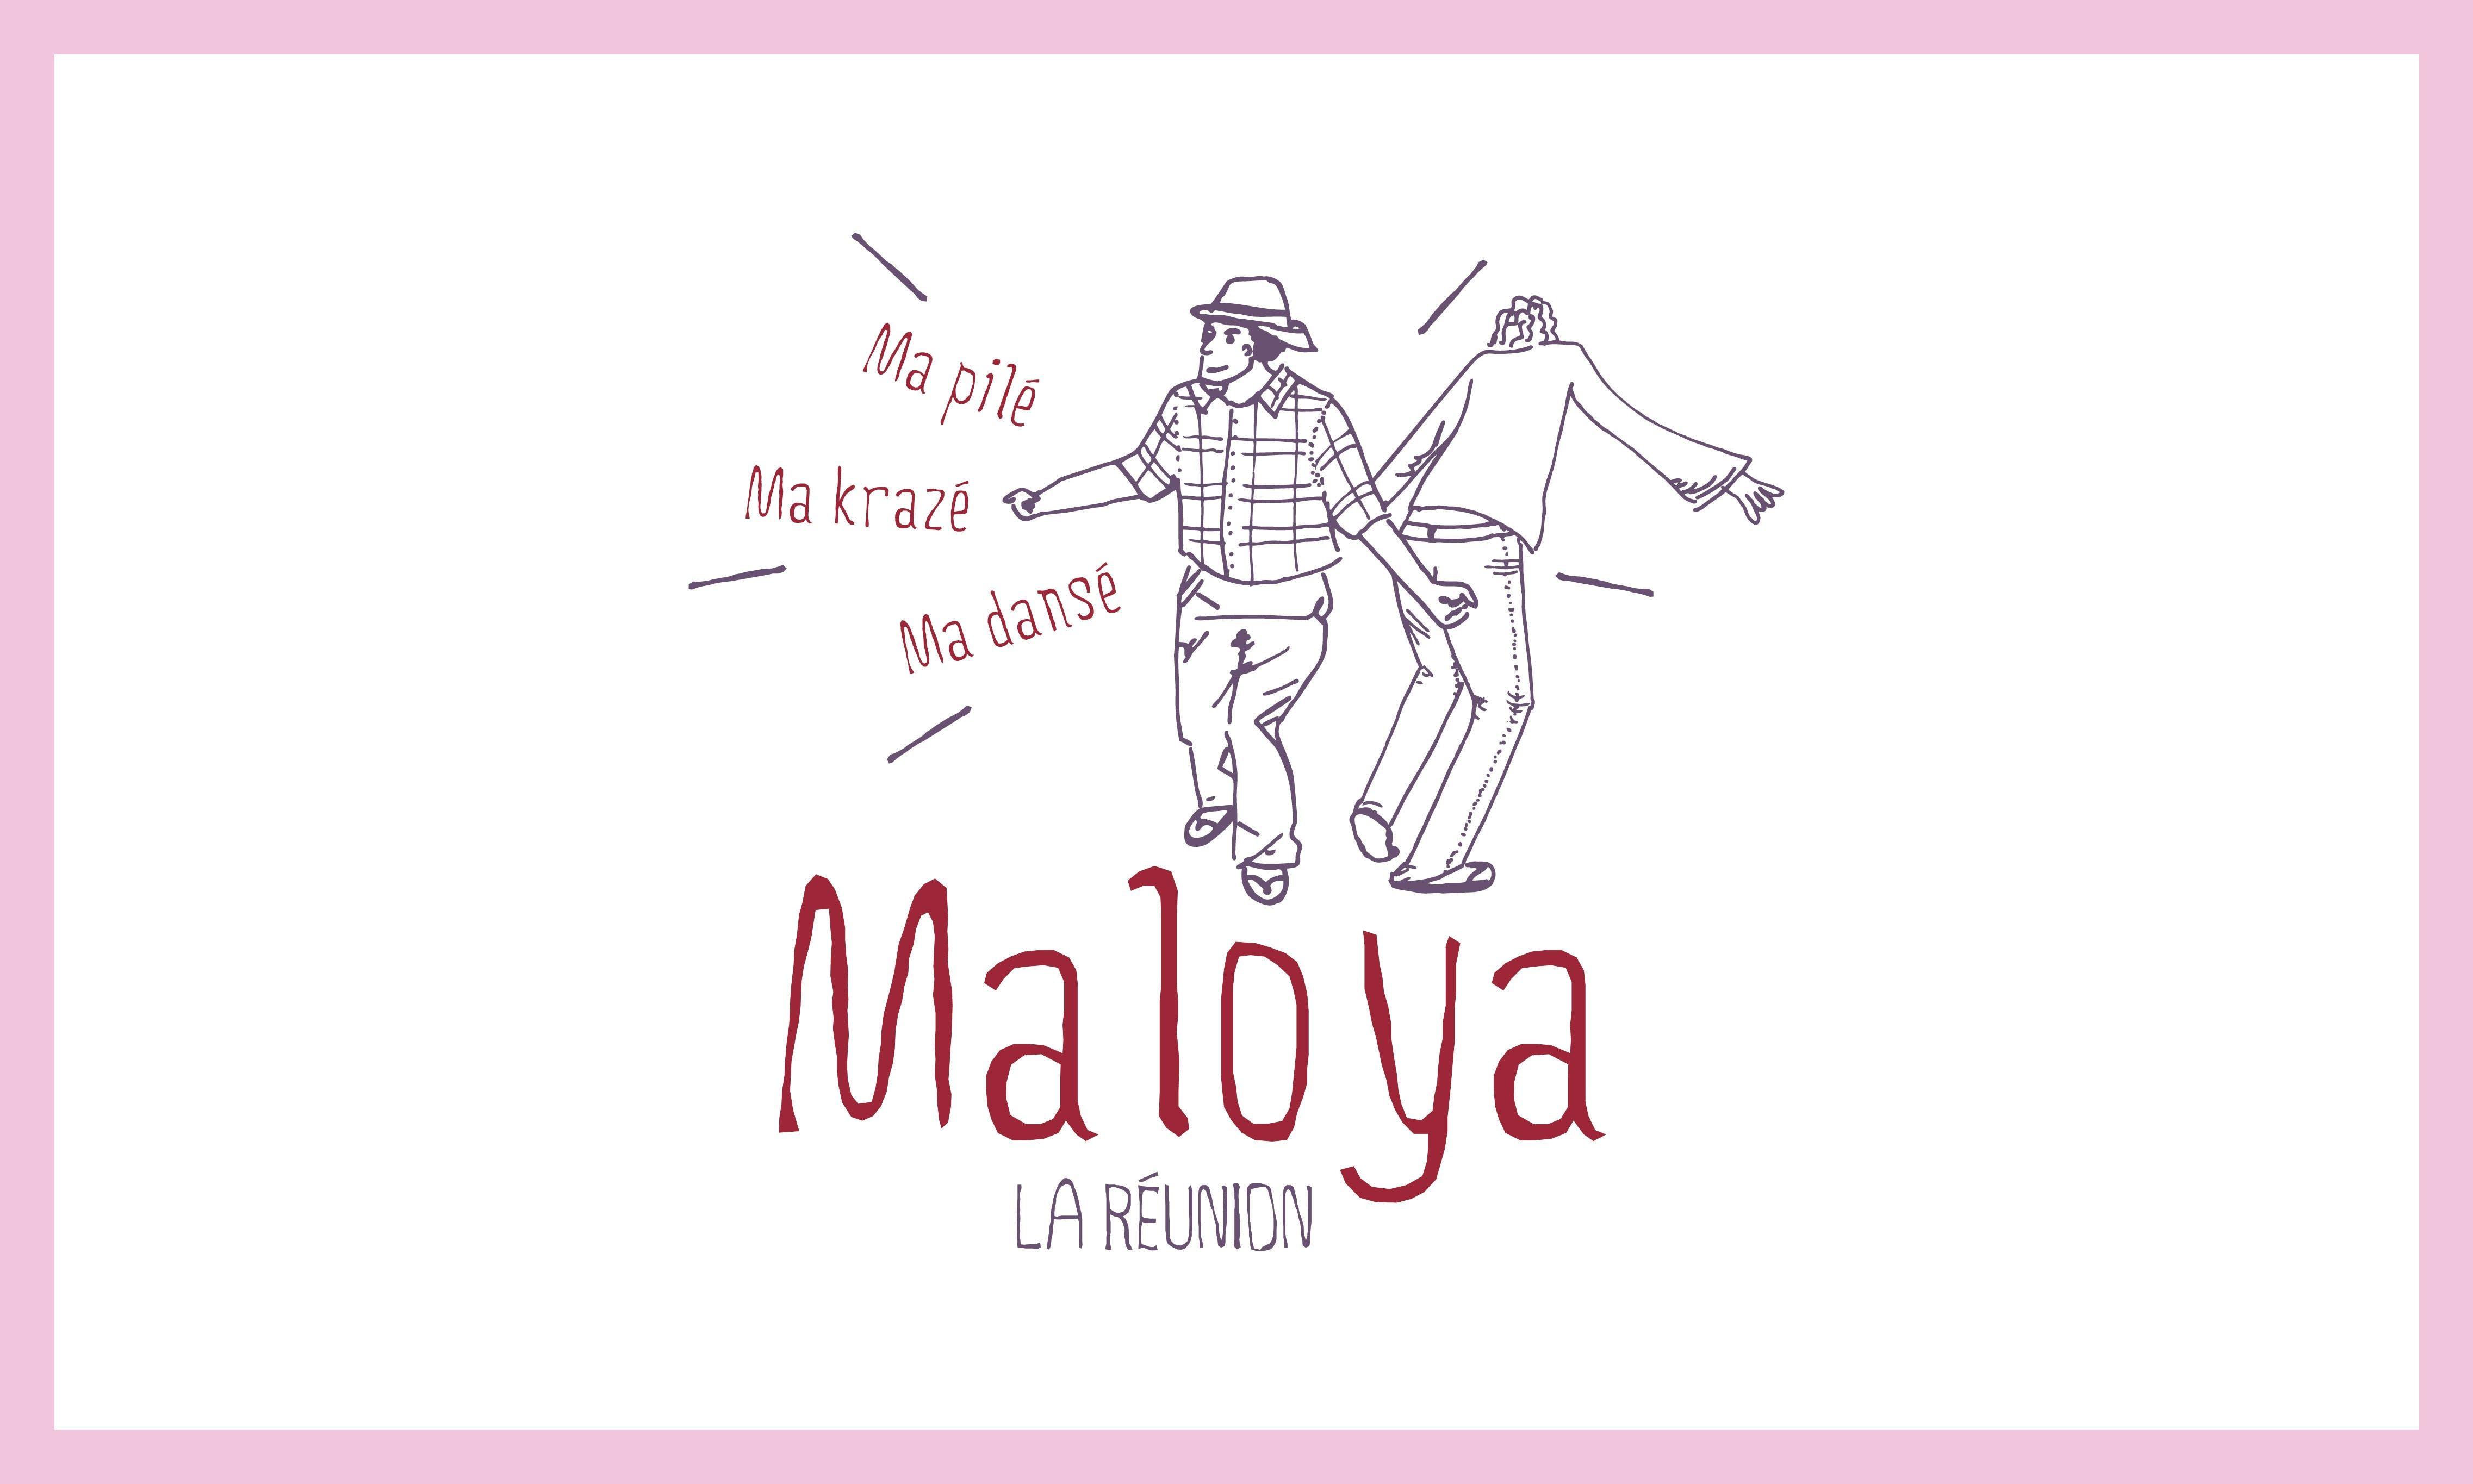 Illustration of people dancing Maloya